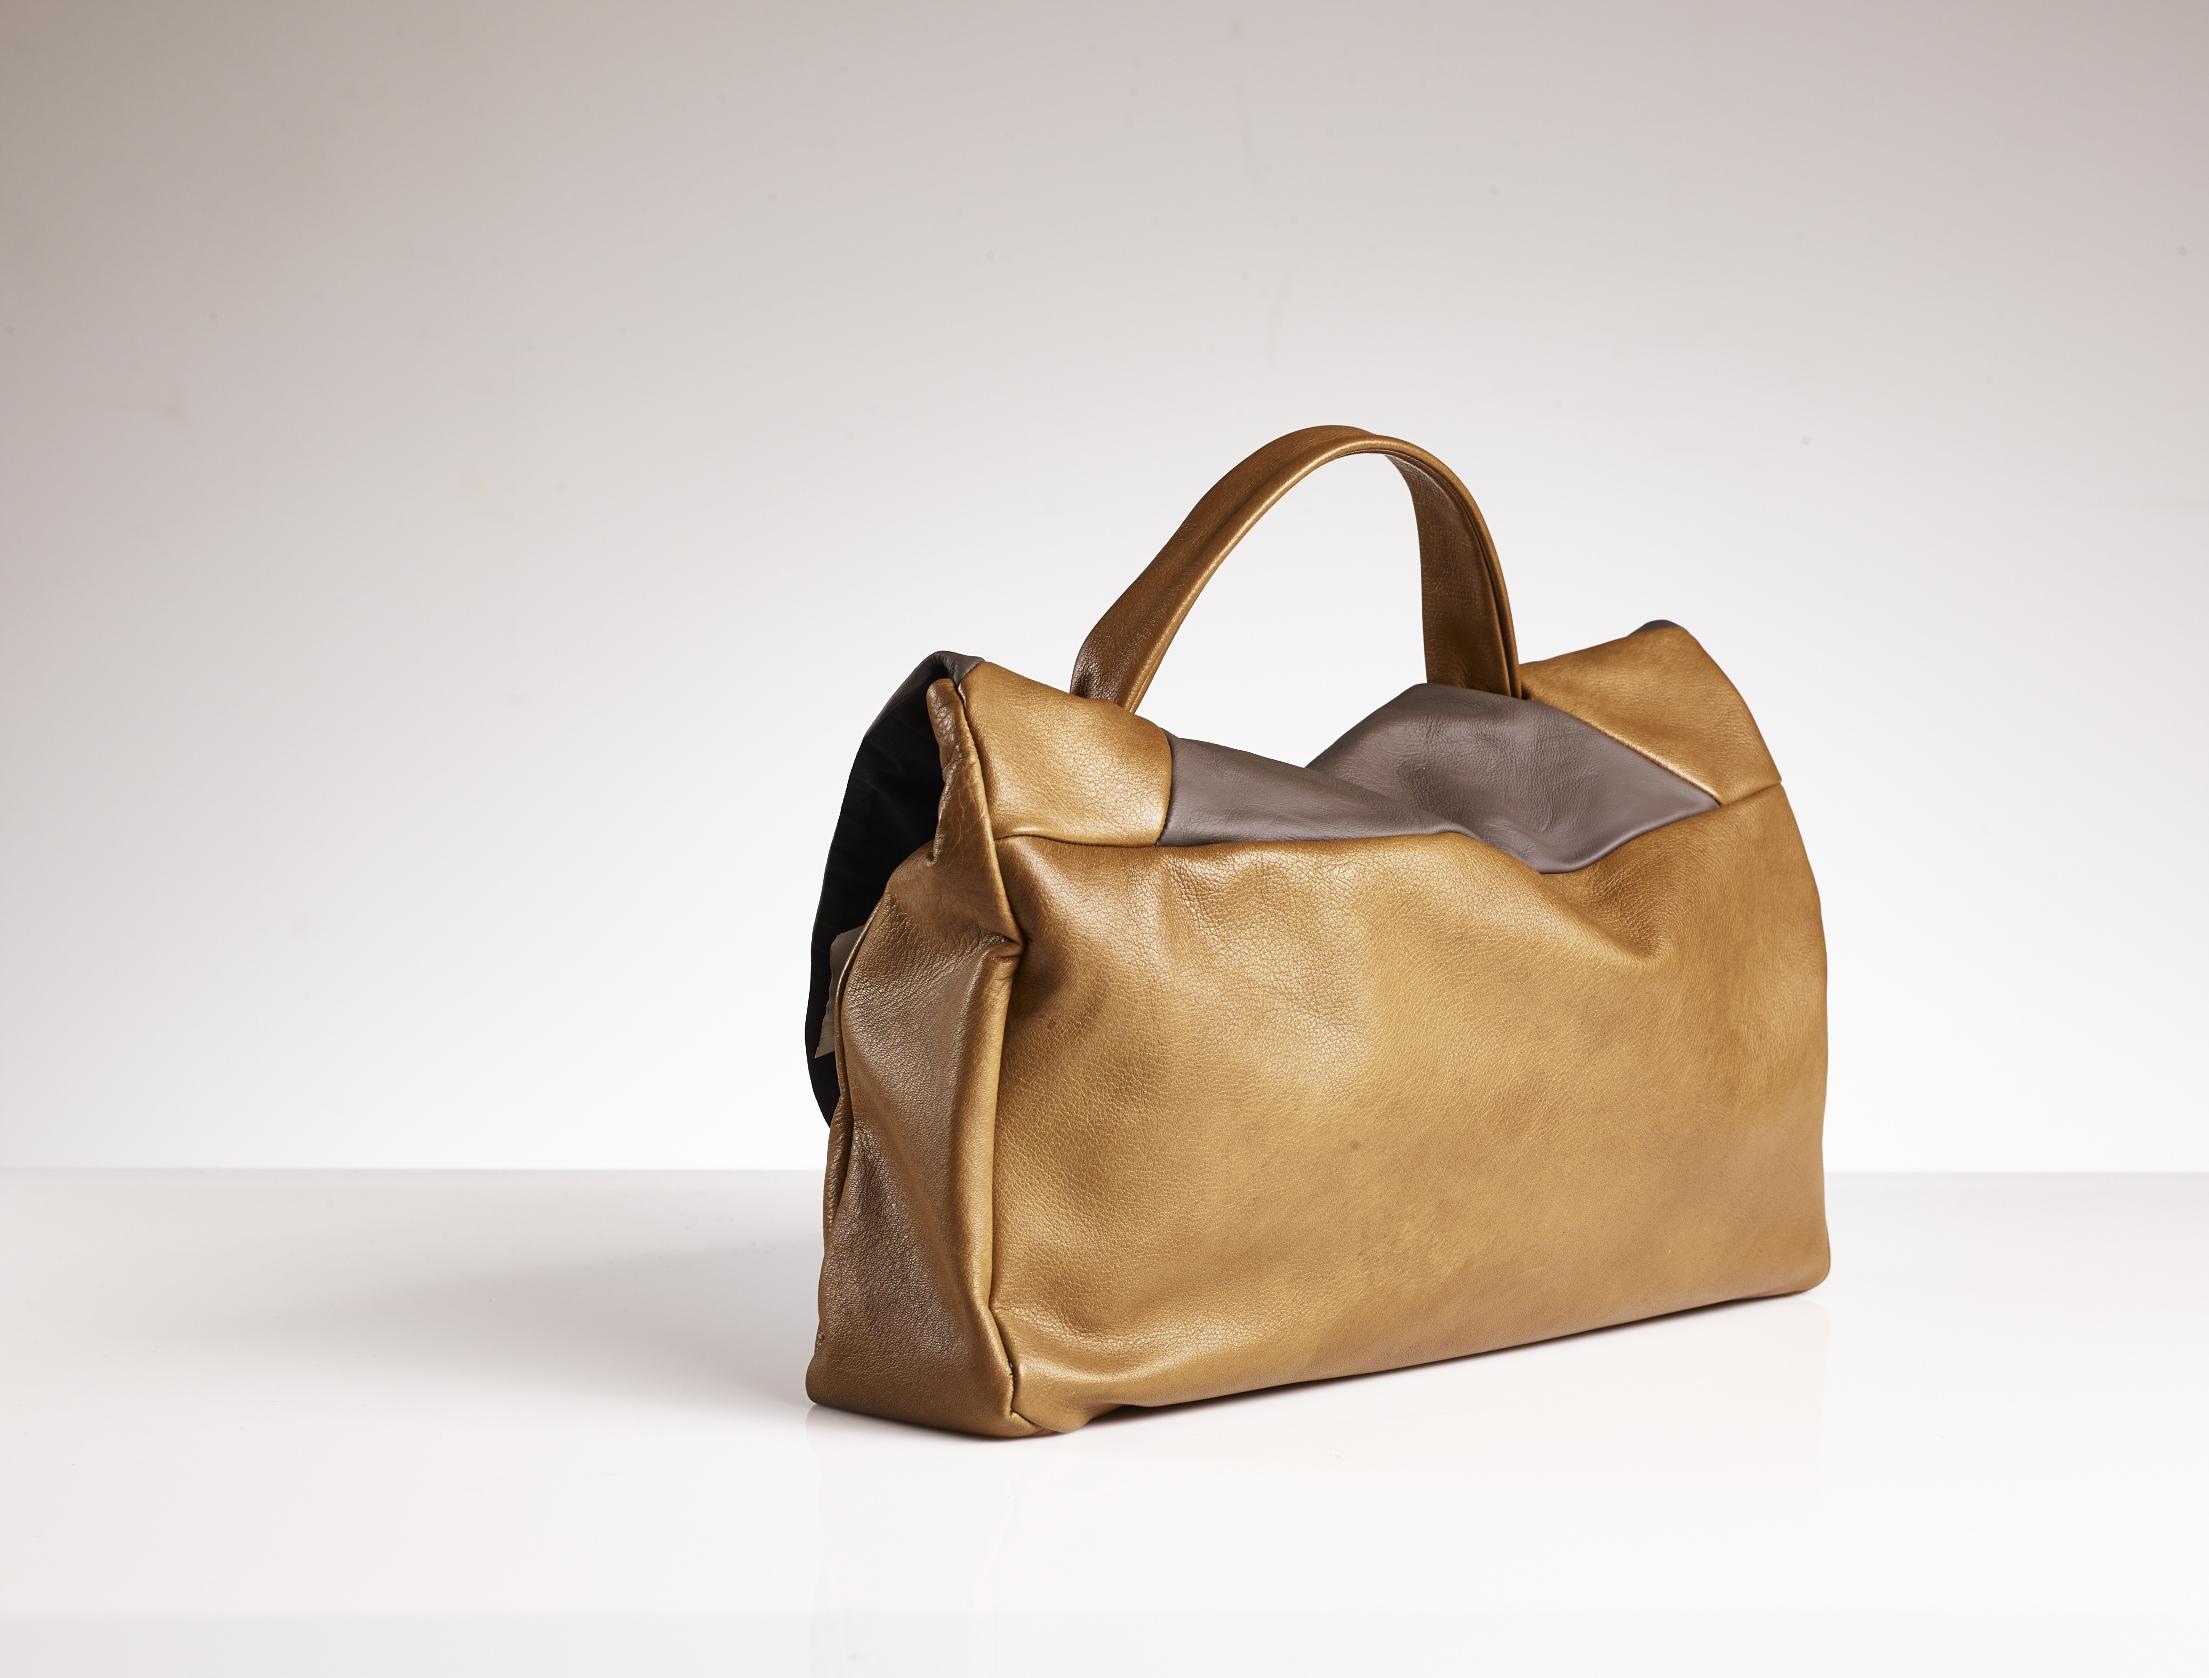 Strehlow handtasche_25981.jpg